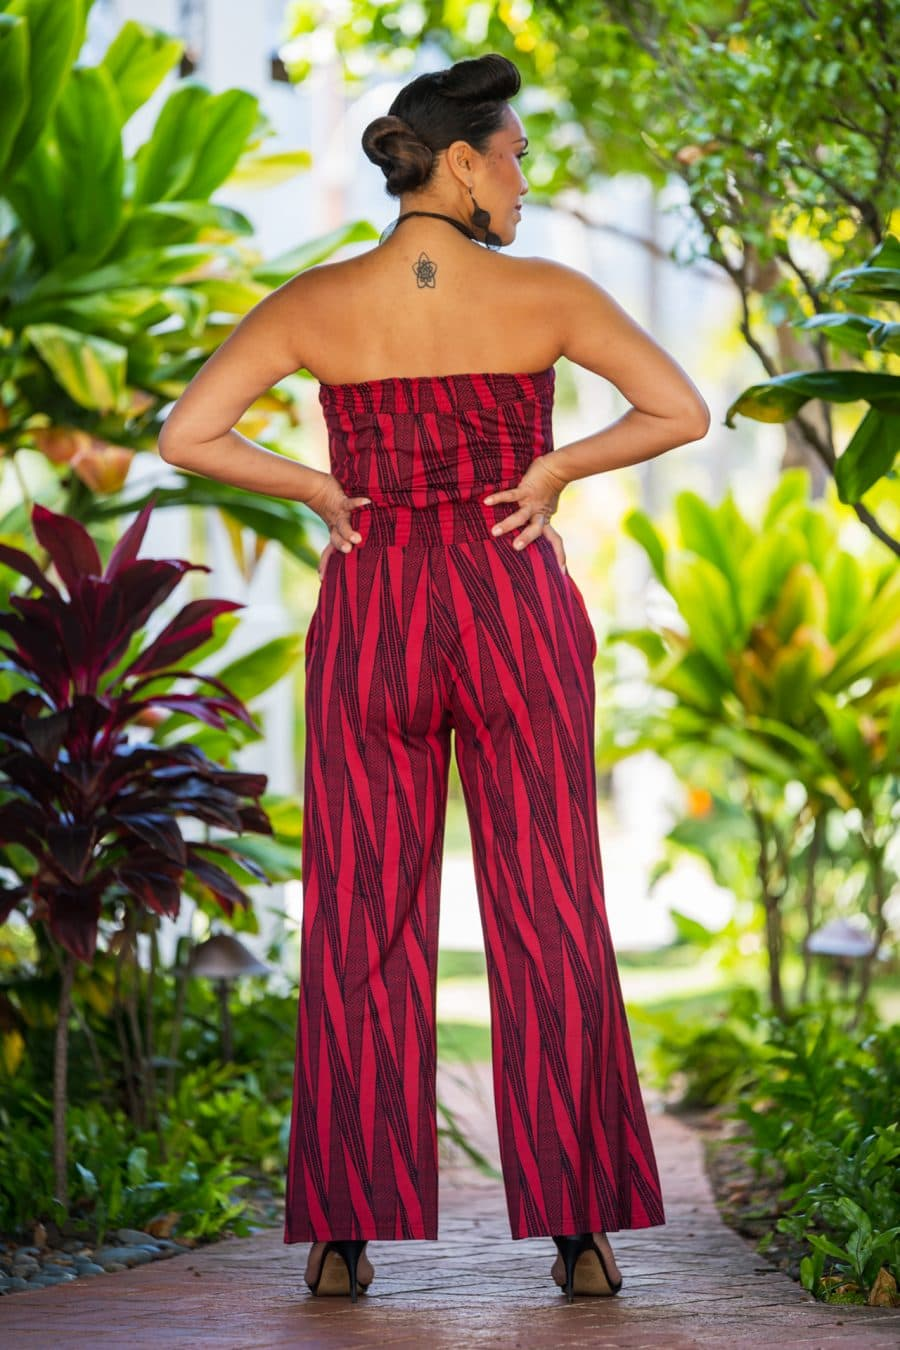 Model wearing Pakalana Jumpsuit in Brick Red Deepwell Kialoa Pattern - Back View